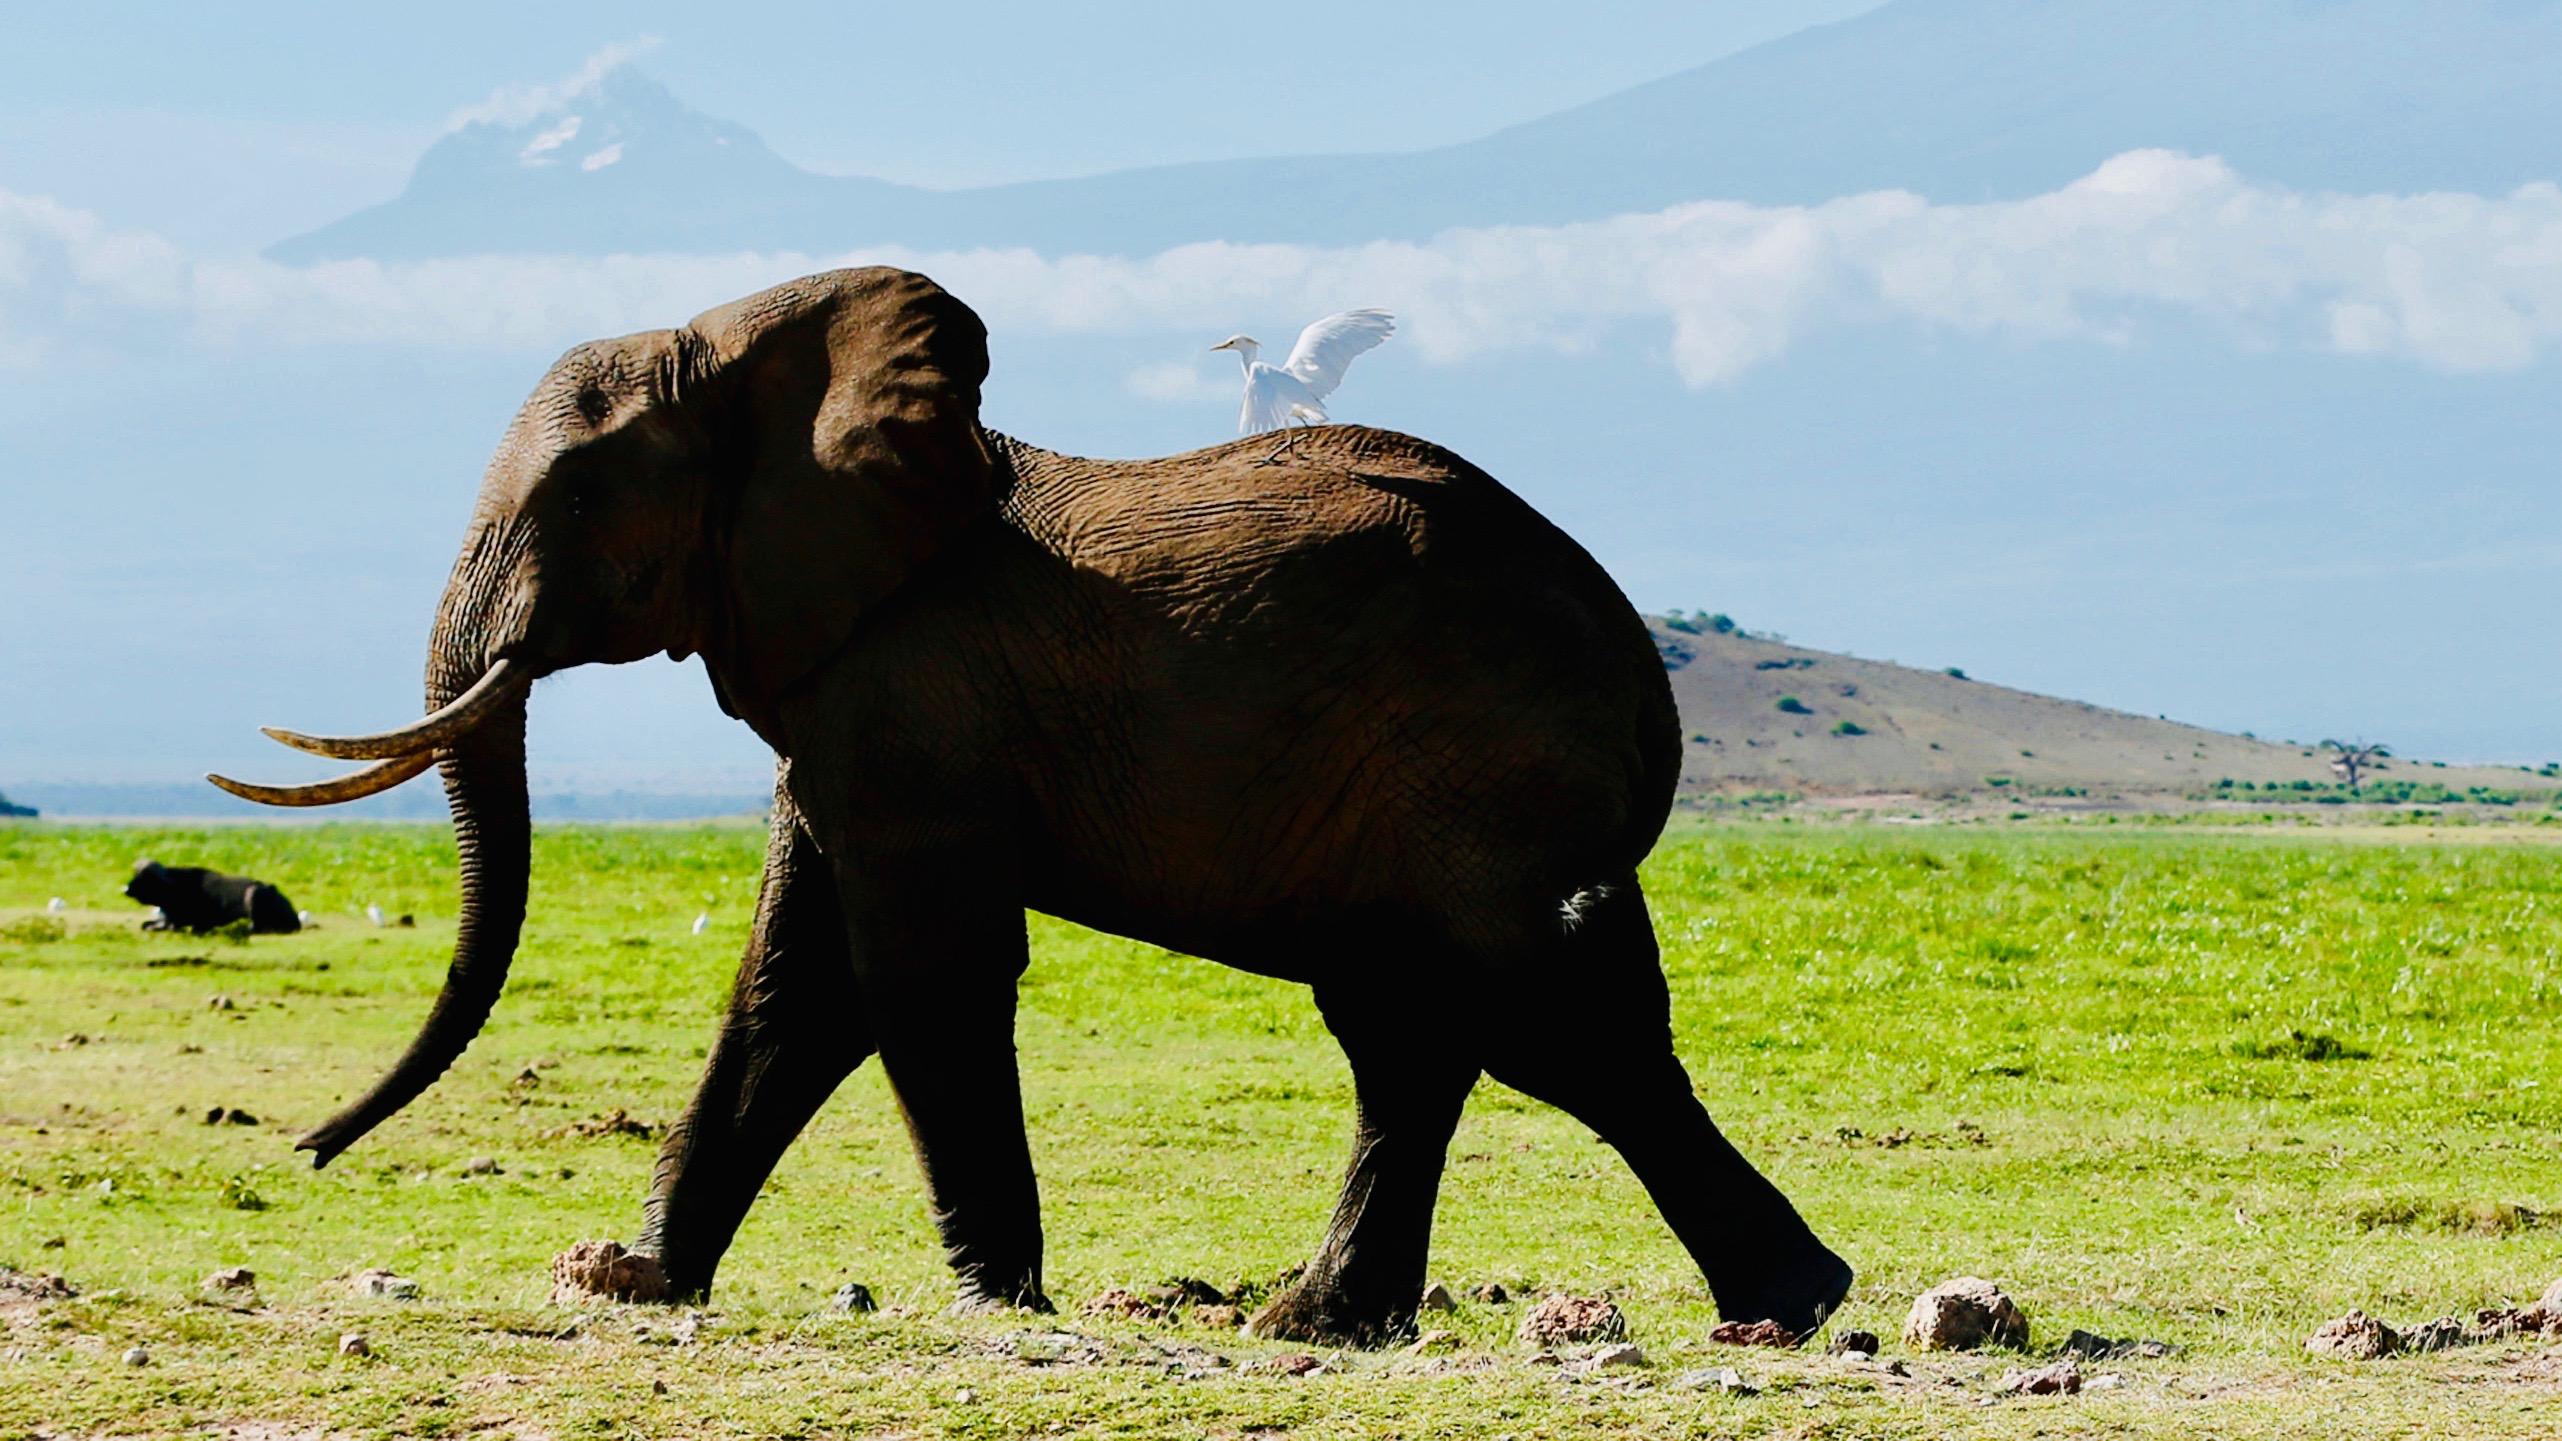 African Savanna Elephant   The Animal Facts   Habitat